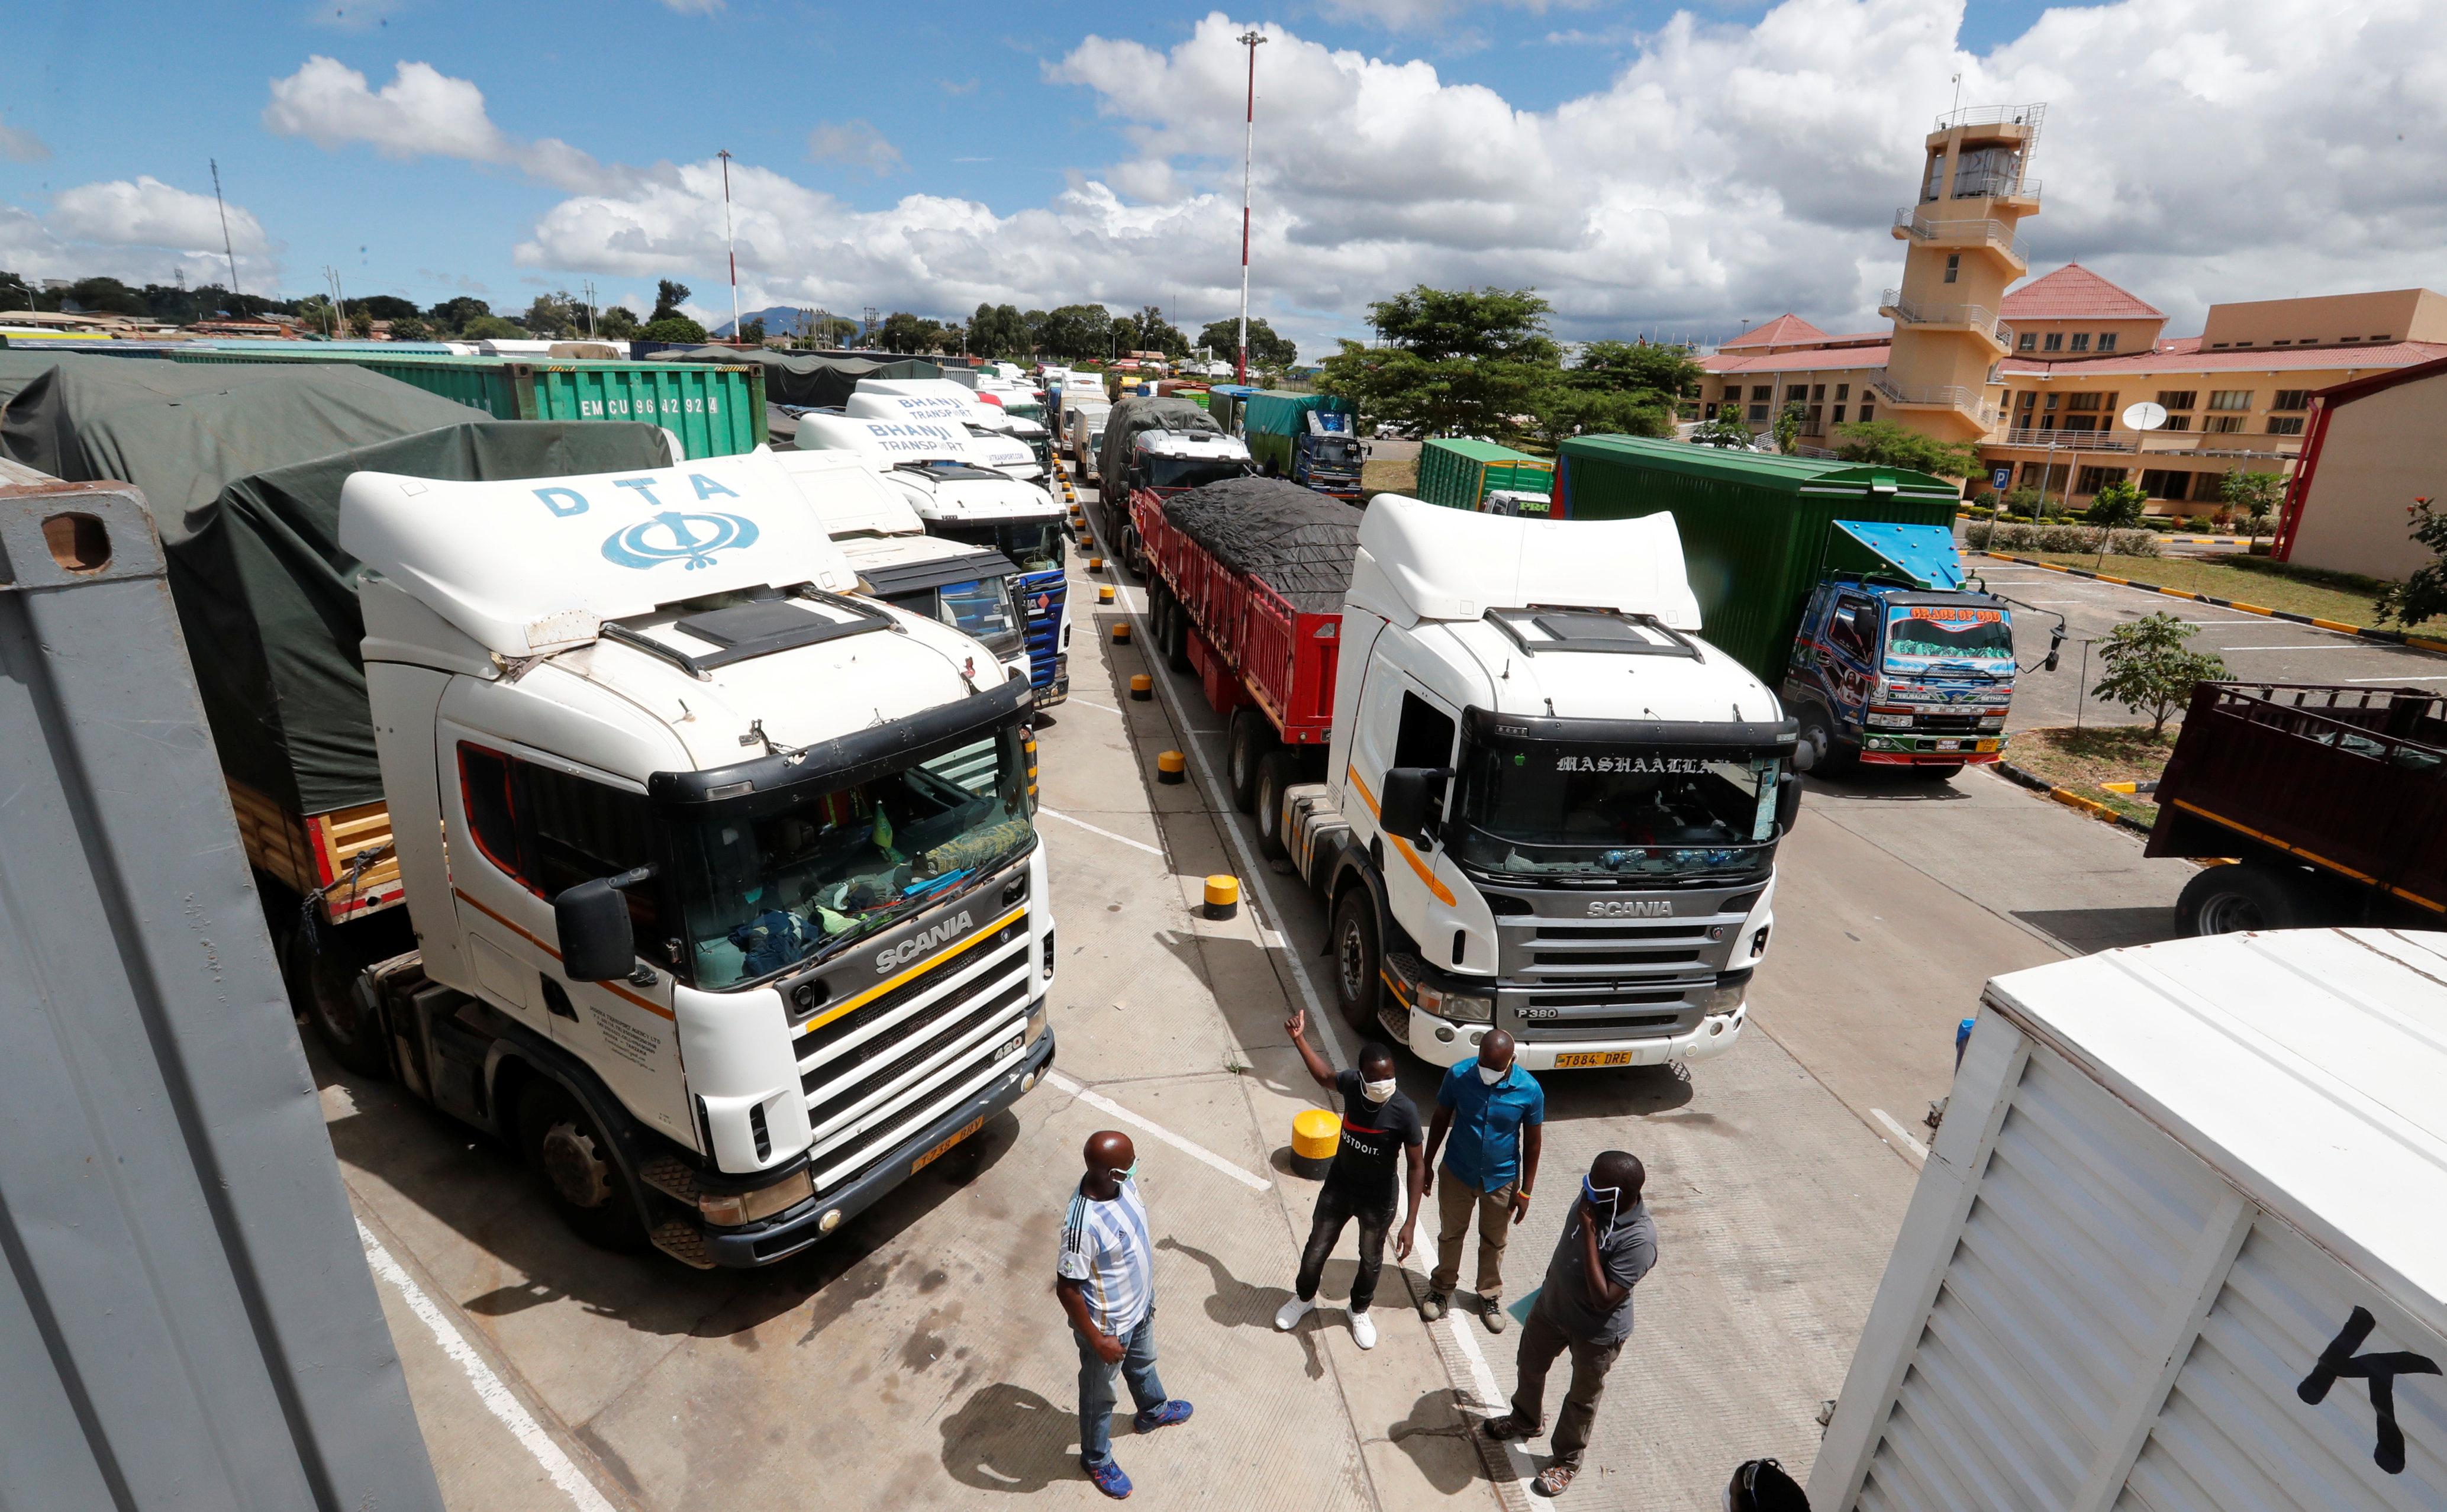 Truck drivers wait near their parked vehicles for the coronavirus disease (COVID-19) test results at the Namanga one stop border crossing point between Kenya and Tanzania, in Namanga, Kenya May 12, 2020. REUTERS/Thomas Mukoya